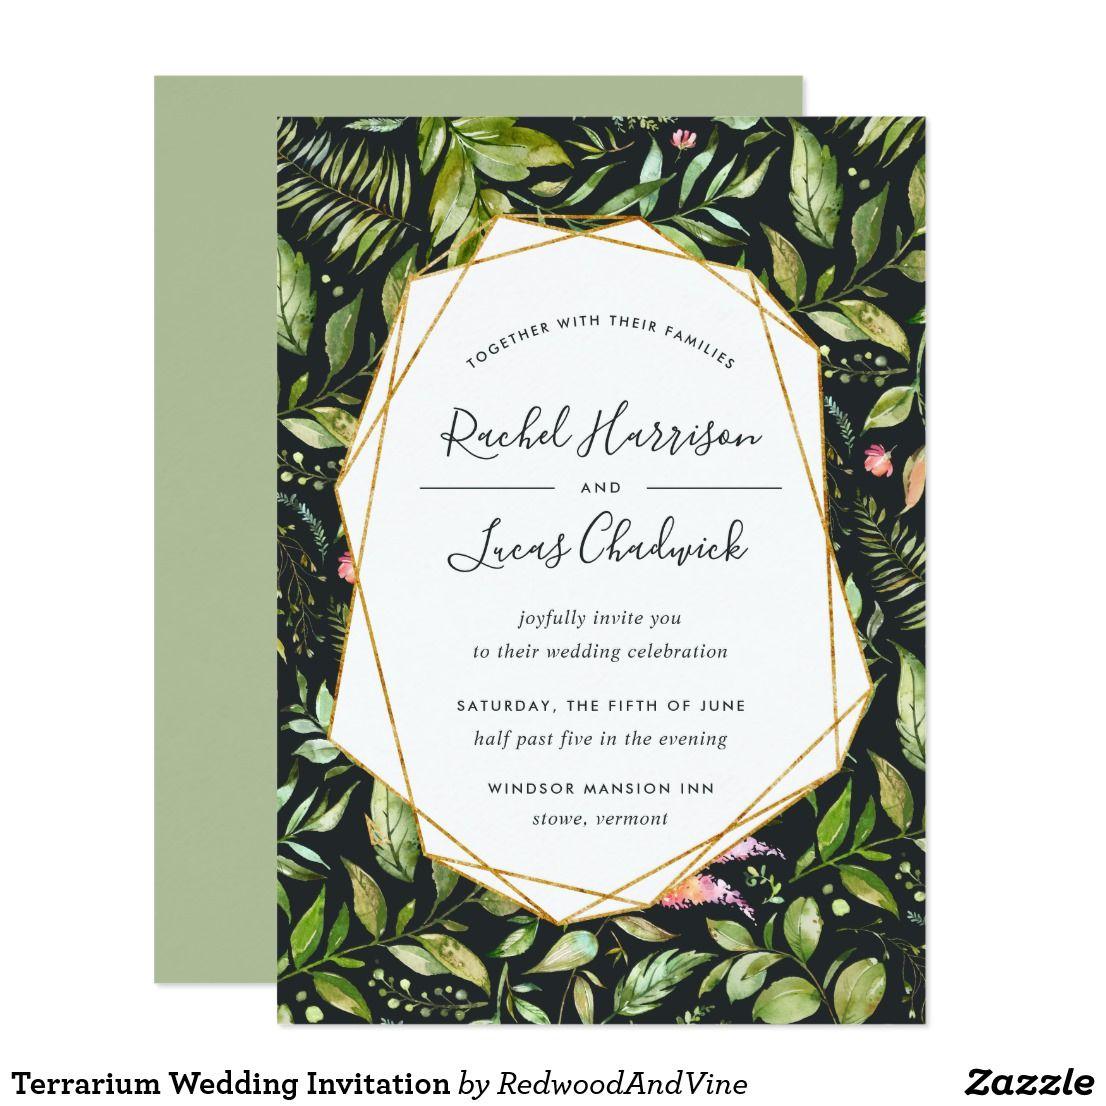 Terrarium Wedding Invitation | Invites wedding, Favors and Wedding